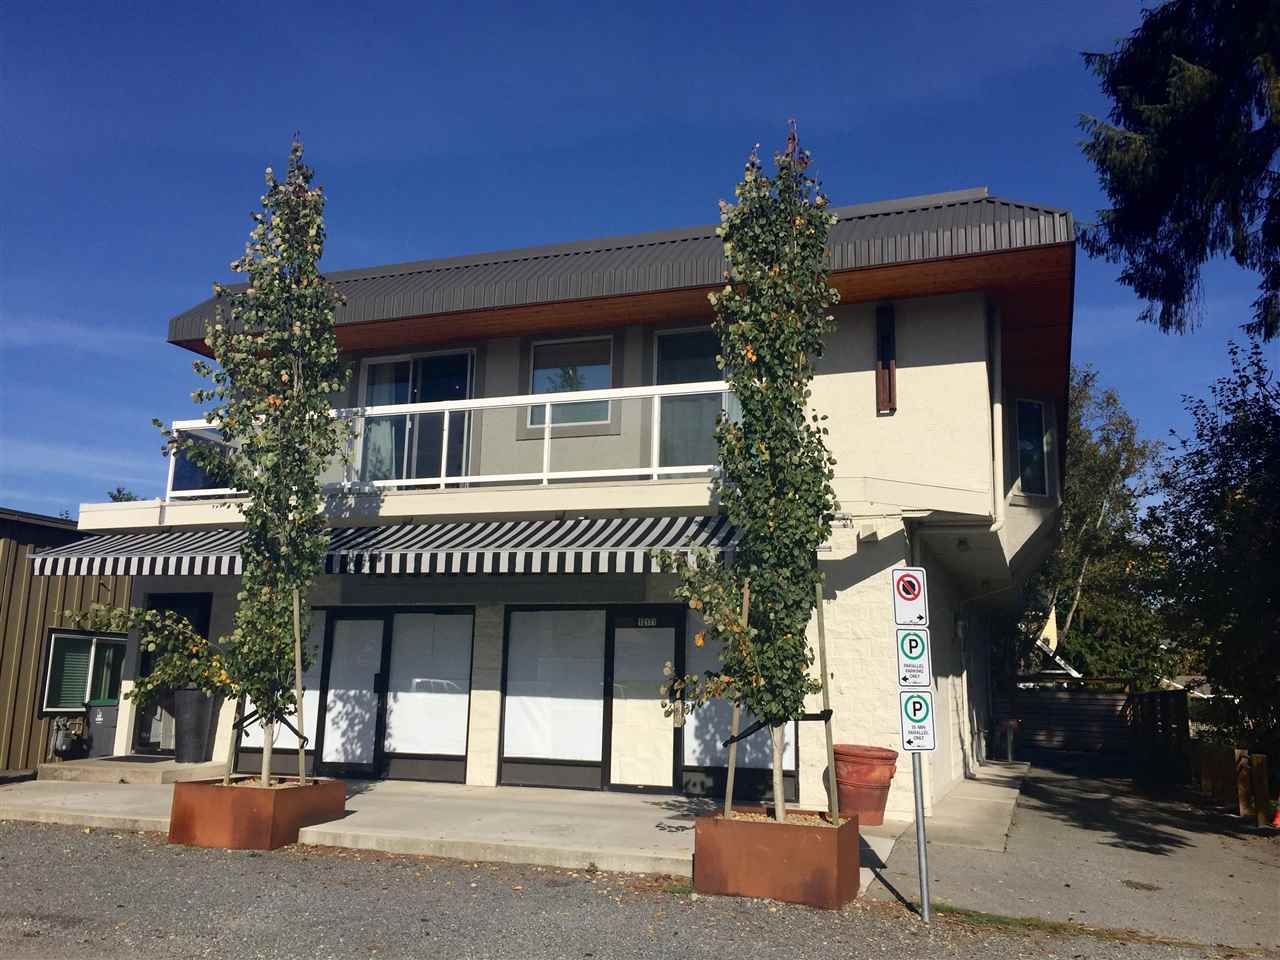 Main Photo: 12171 SULLIVAN Street in Surrey: Crescent Bch Ocean Pk. Retail for sale (South Surrey White Rock)  : MLS®# C8007715